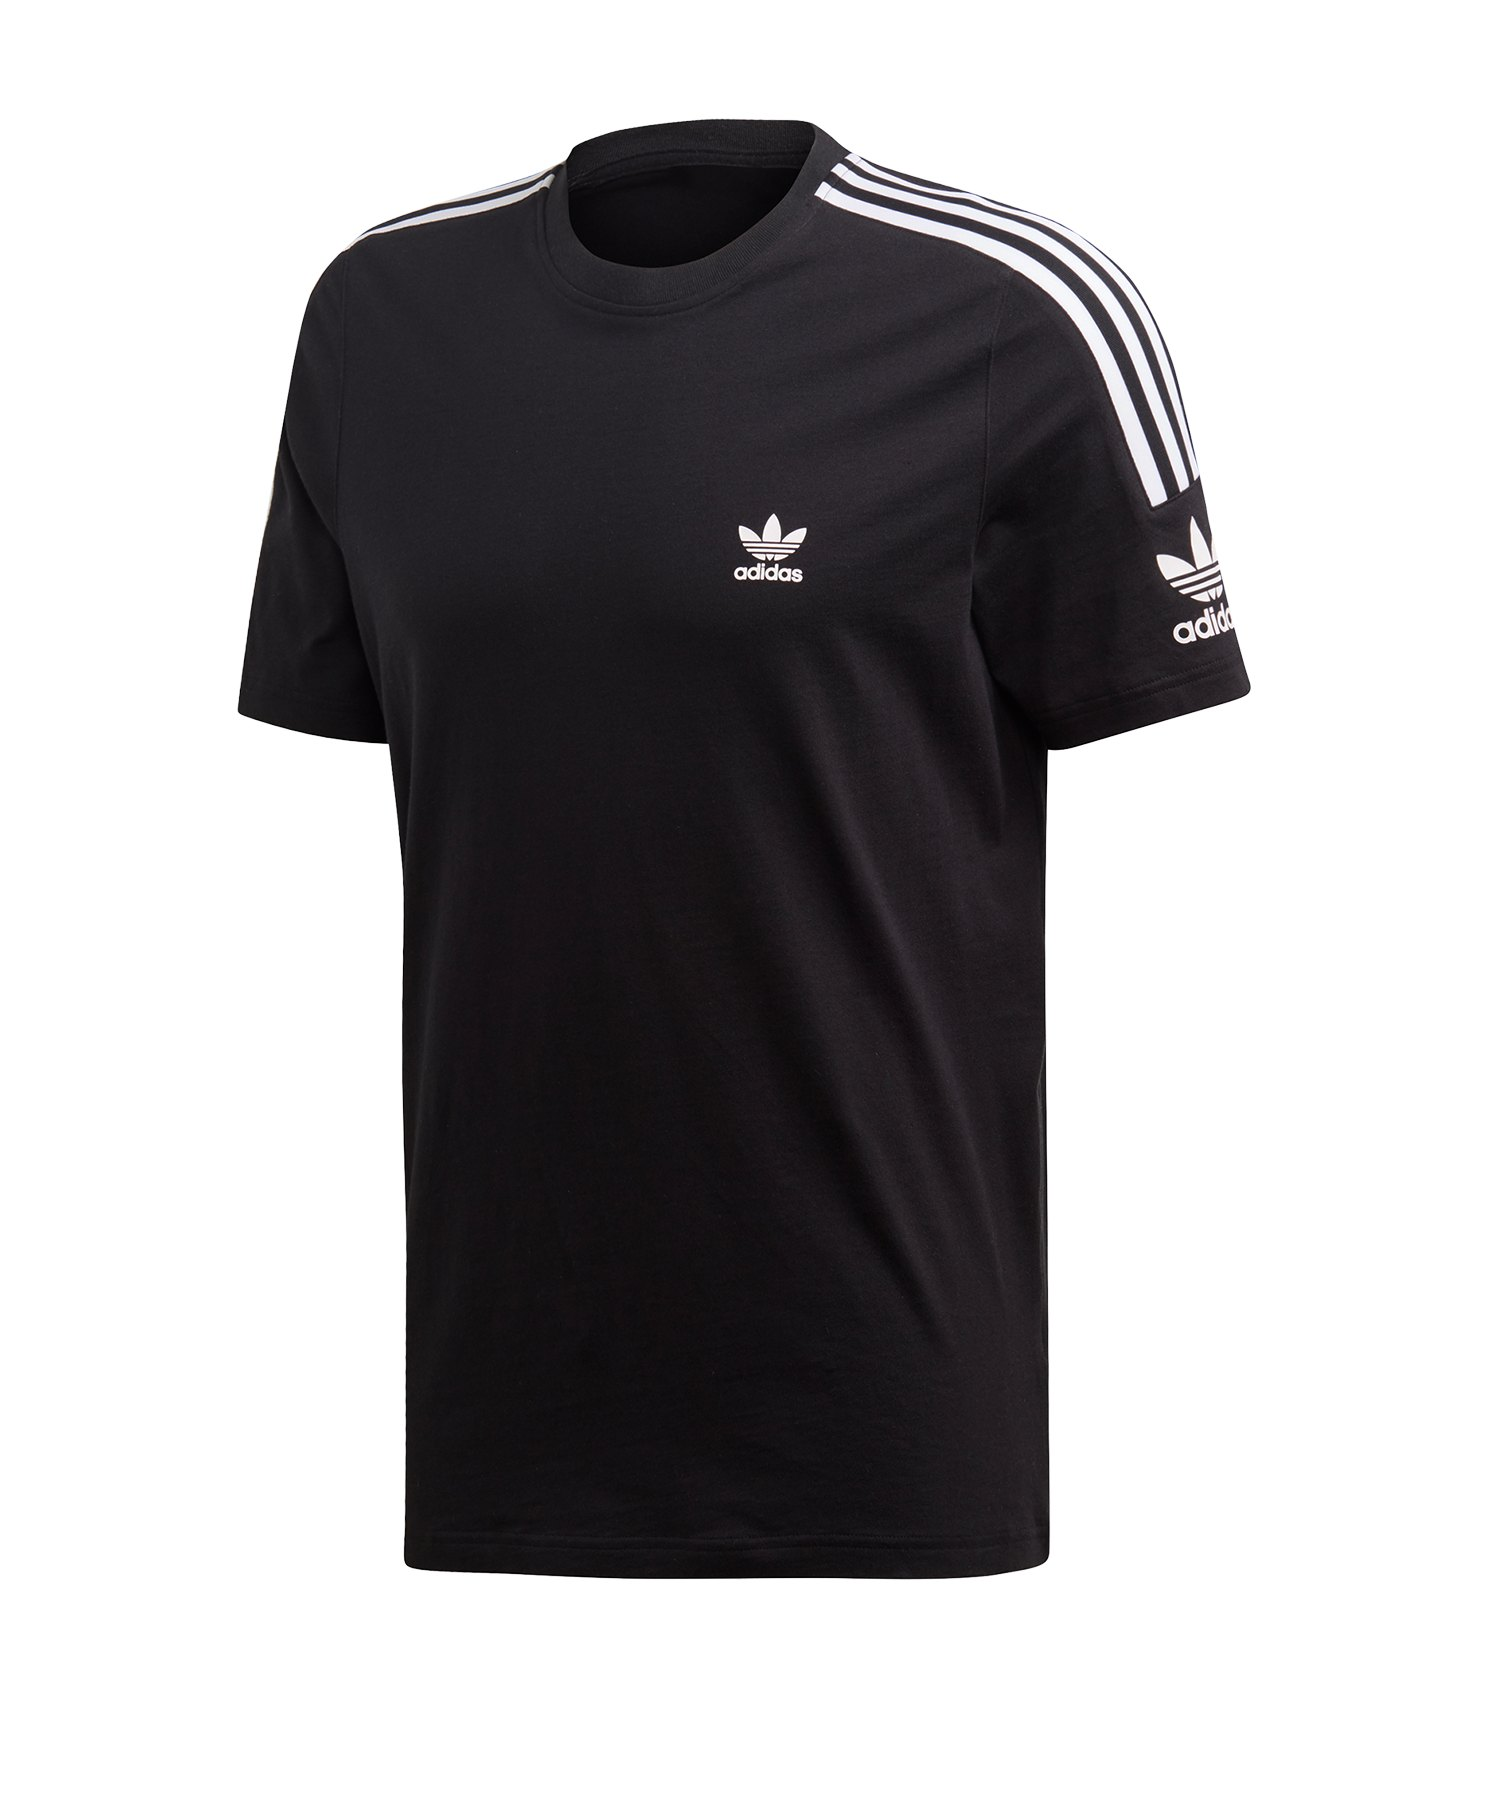 Herren T Shirts & Poloshirts | Adidas Originals Claremont Raglan T Shirt grau ⋆ Linearnetrik